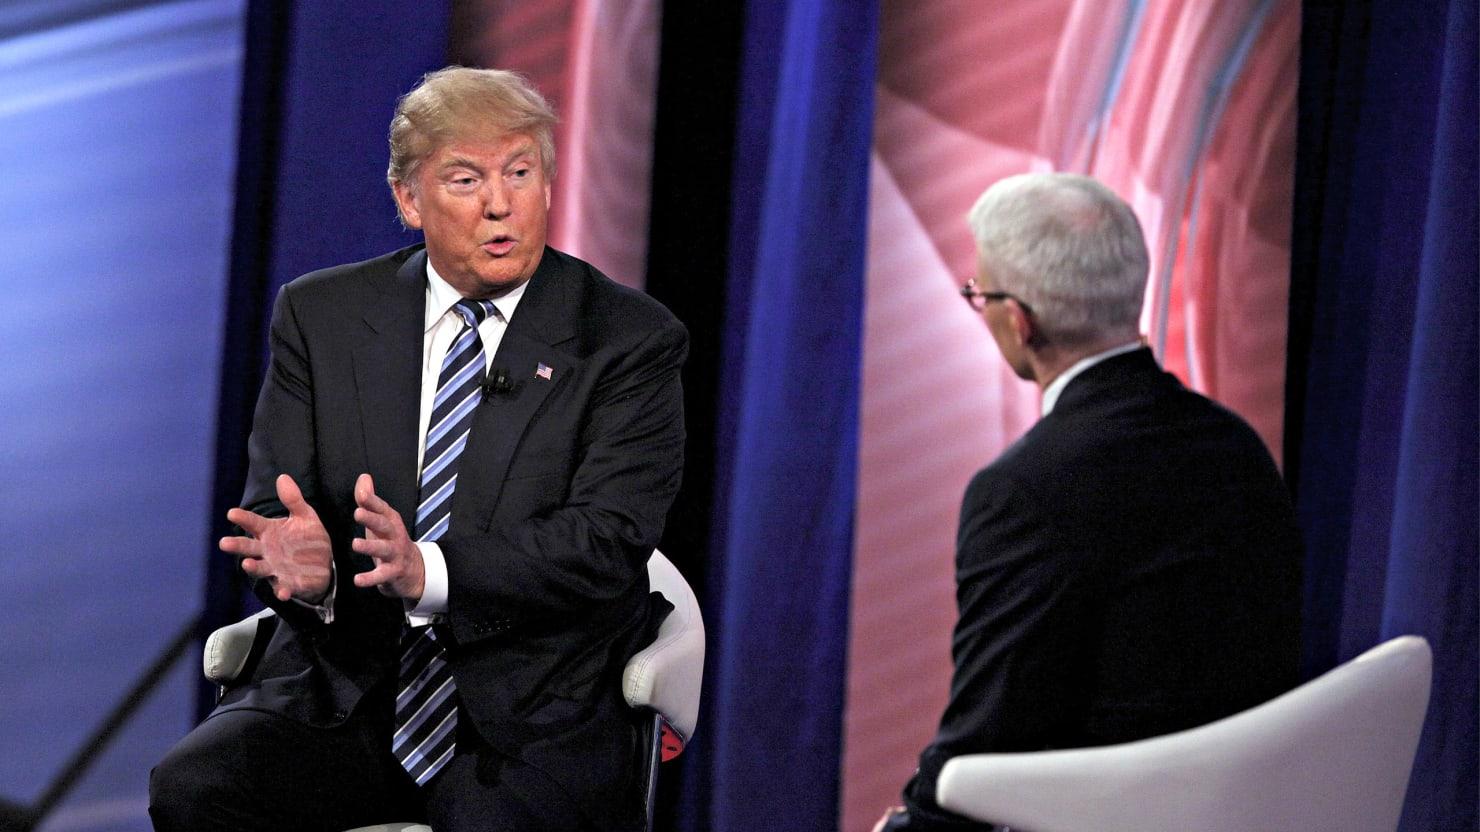 2016 Presidential Debates: Moderators and Full Schedule